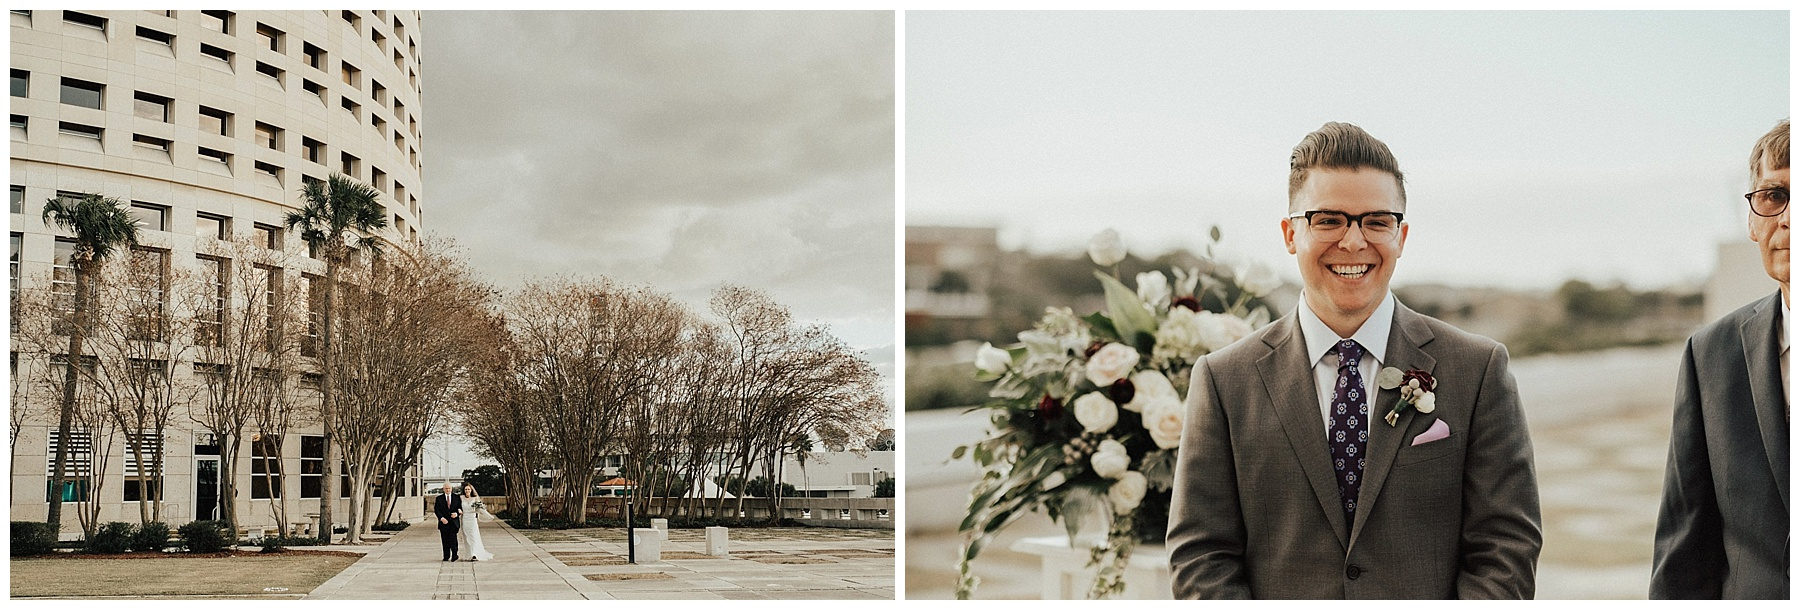 Kylie Garden Wedding Tampa Wedding Photographer-63.jpg